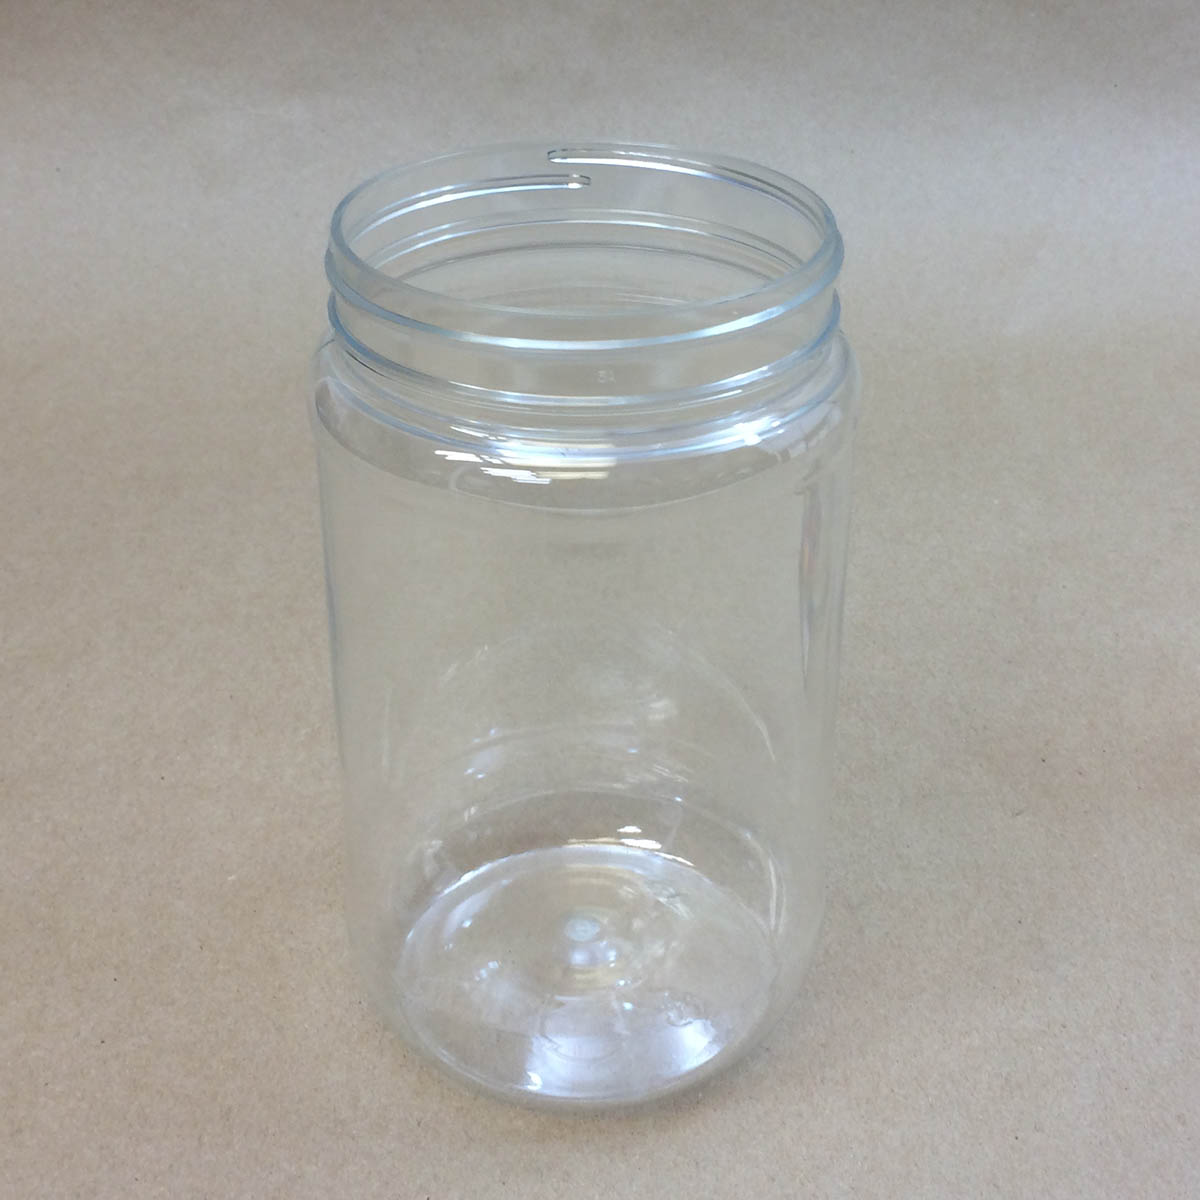 40 oz. Round Plastic Jar